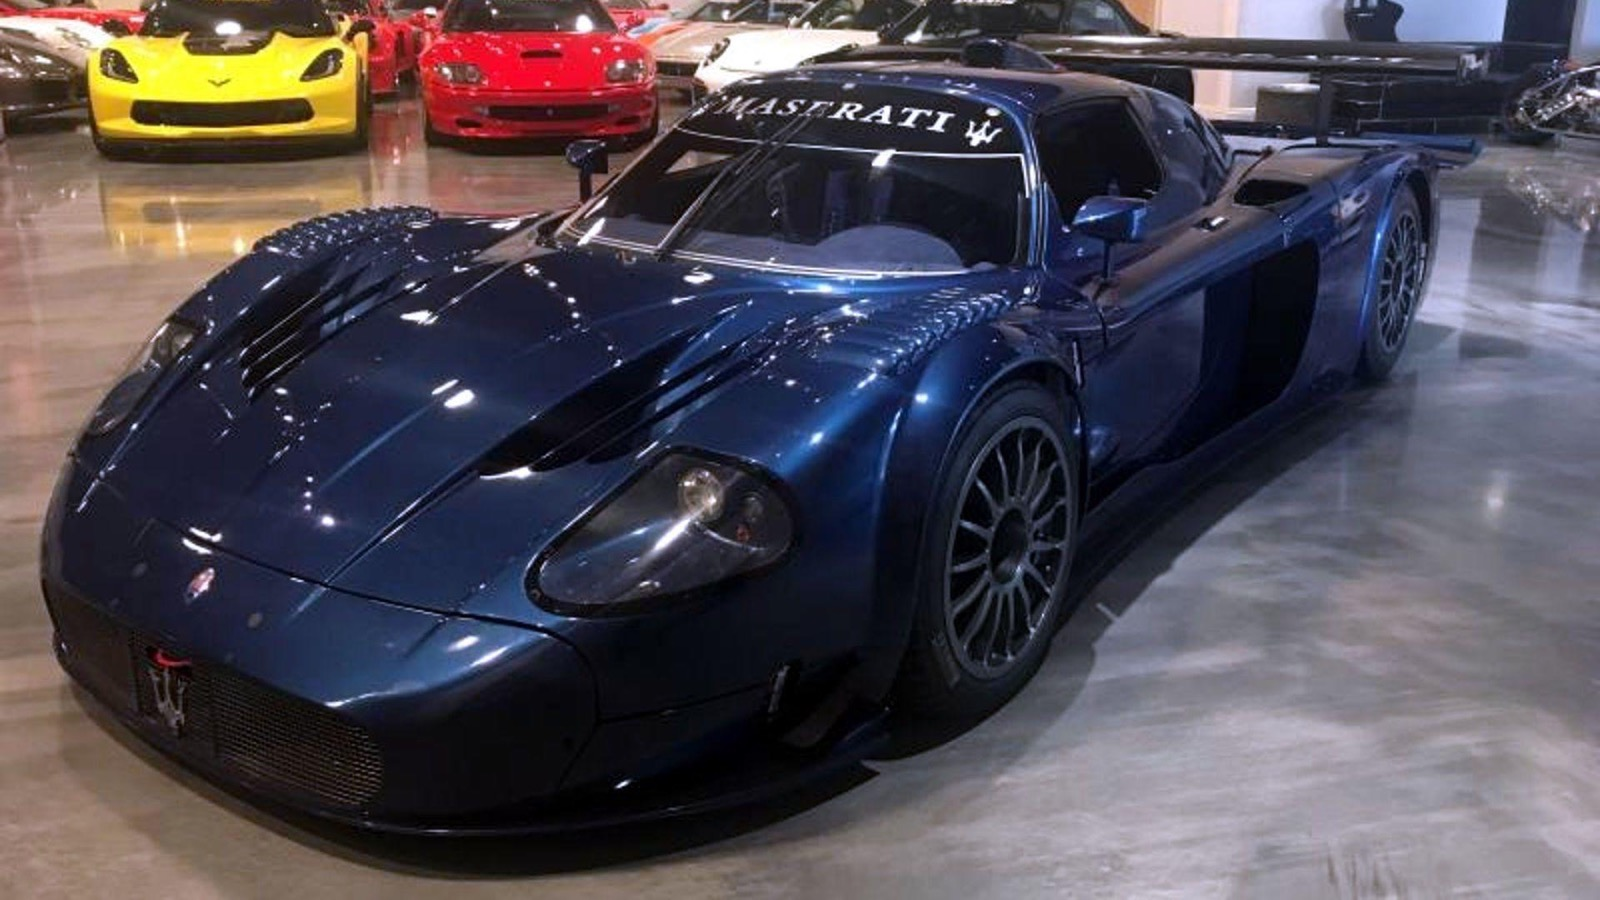 2006_Maserati_MC12_Corsa_05